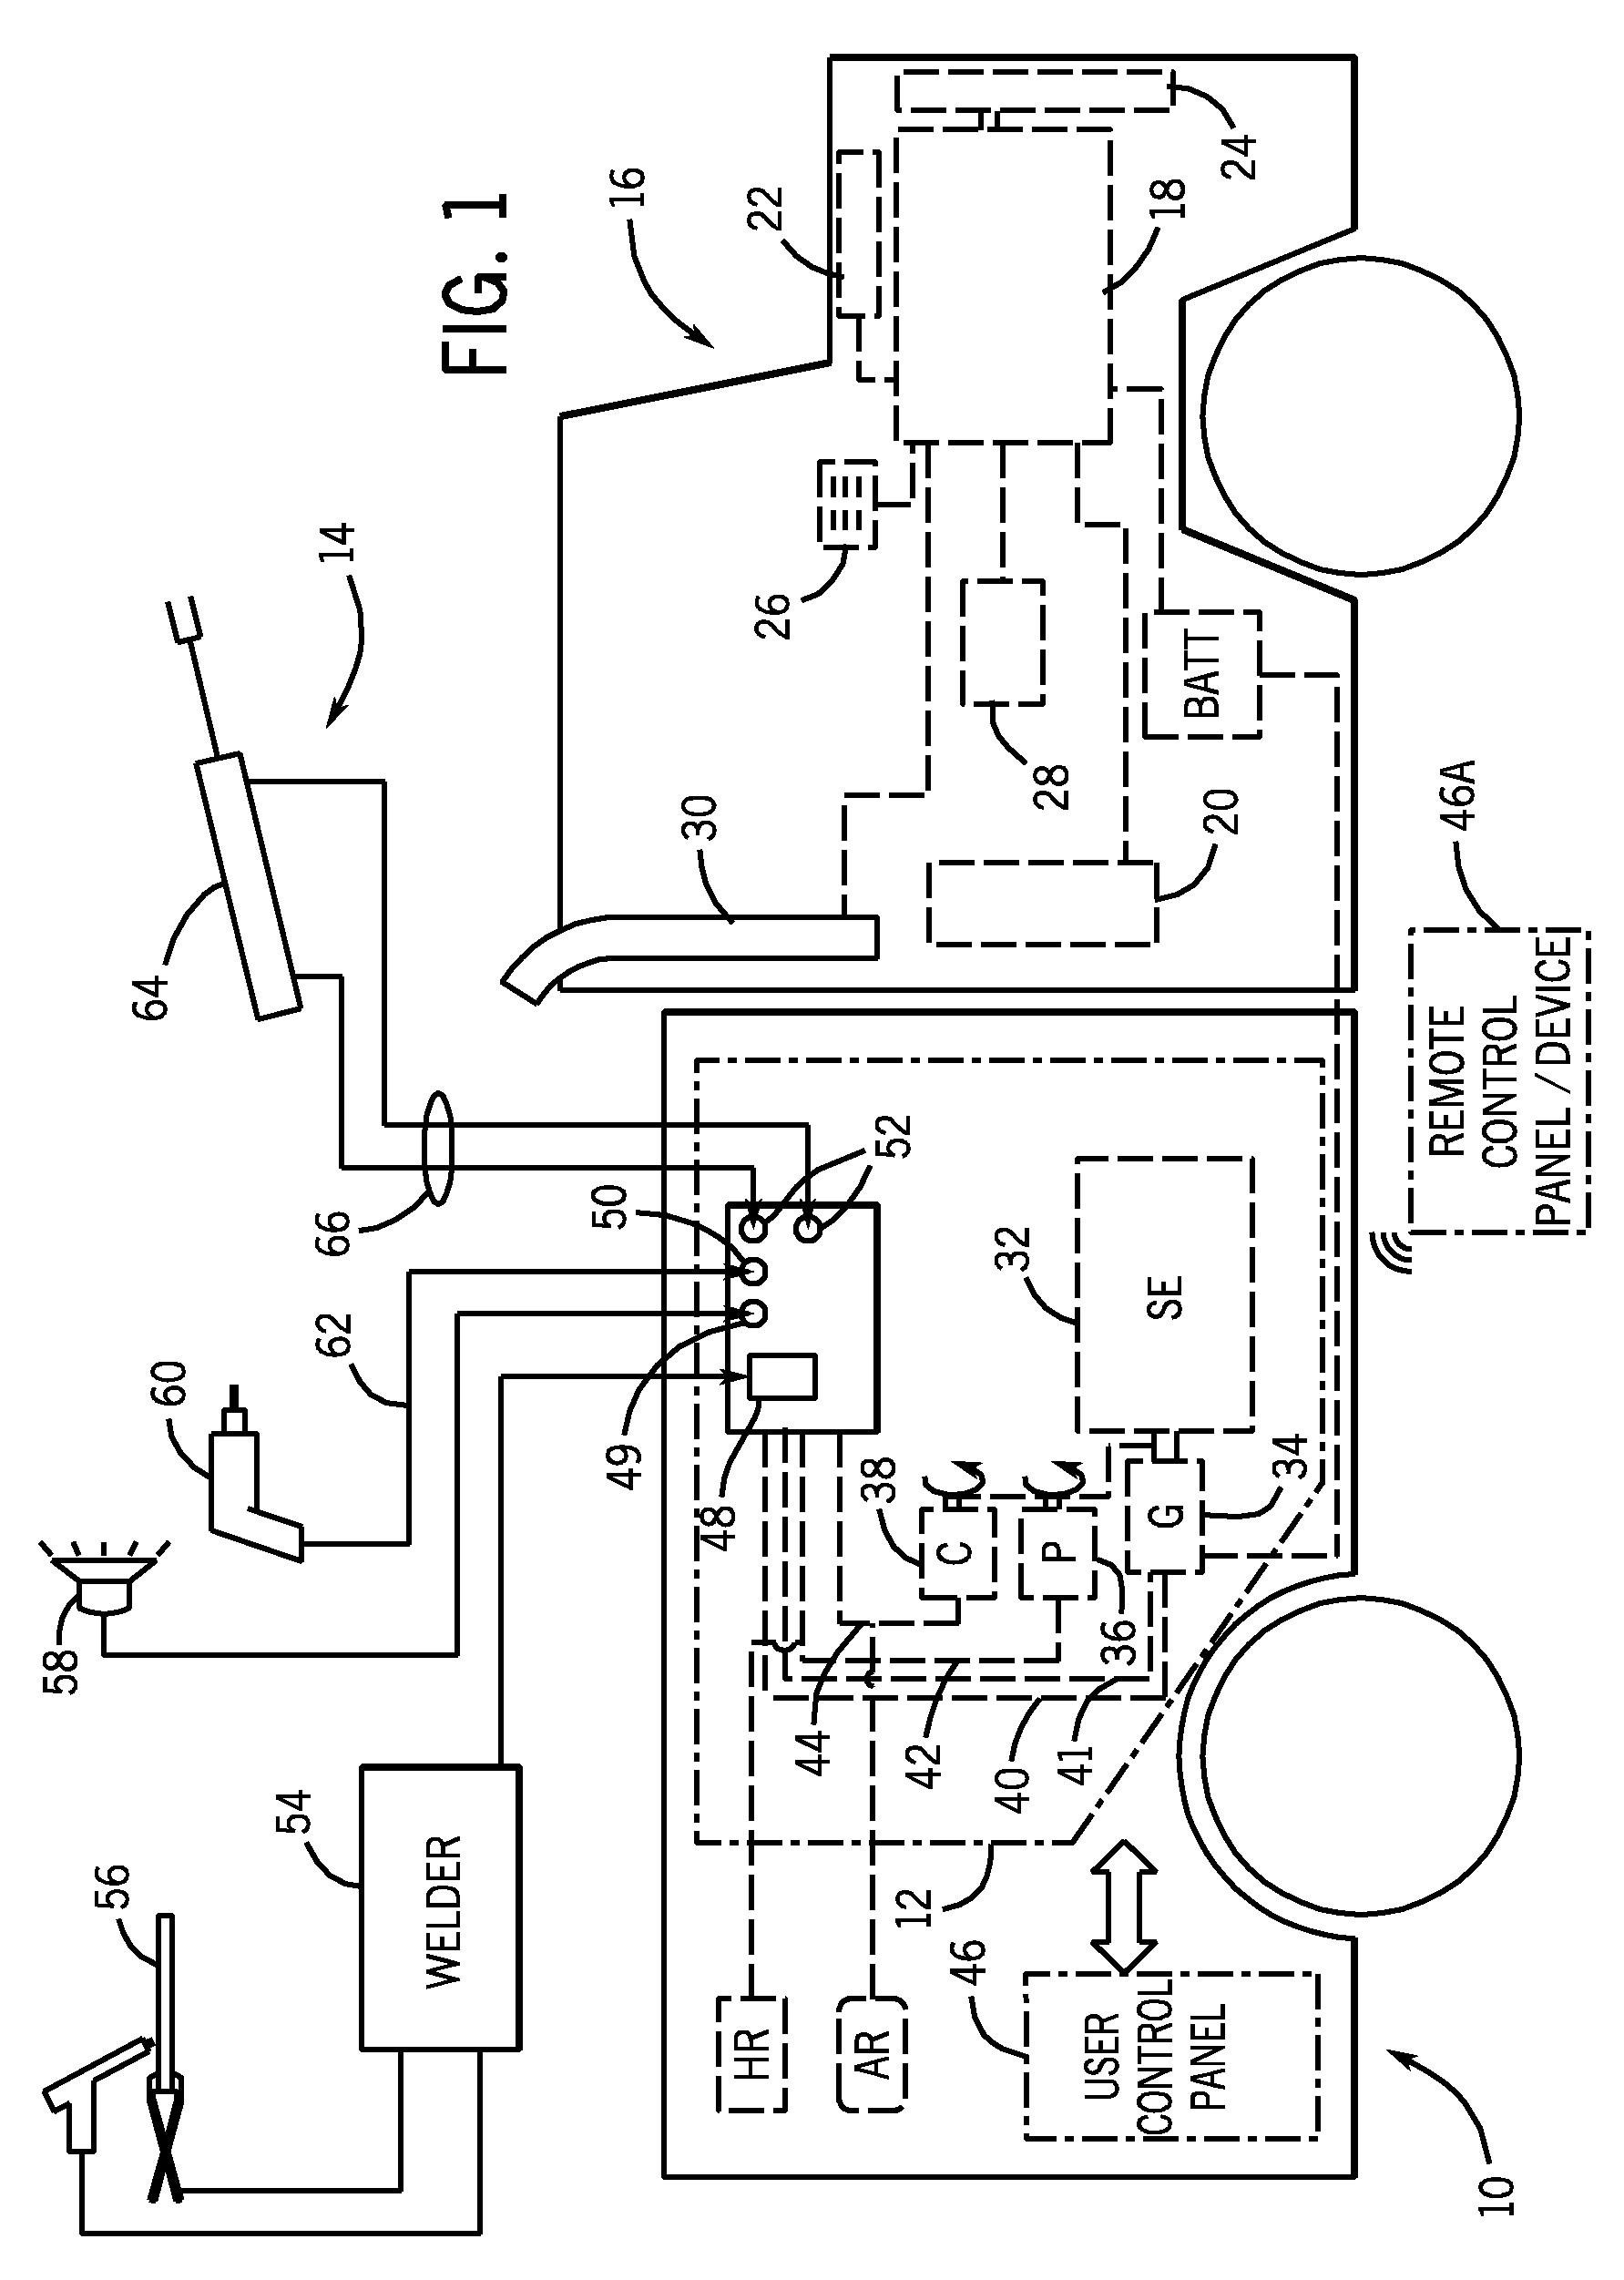 hight resolution of hydraulic pump diagram monarch hydraulic pump wiring diagram wiring rh detoxicrecenze com monarch 12v hydraulic pump